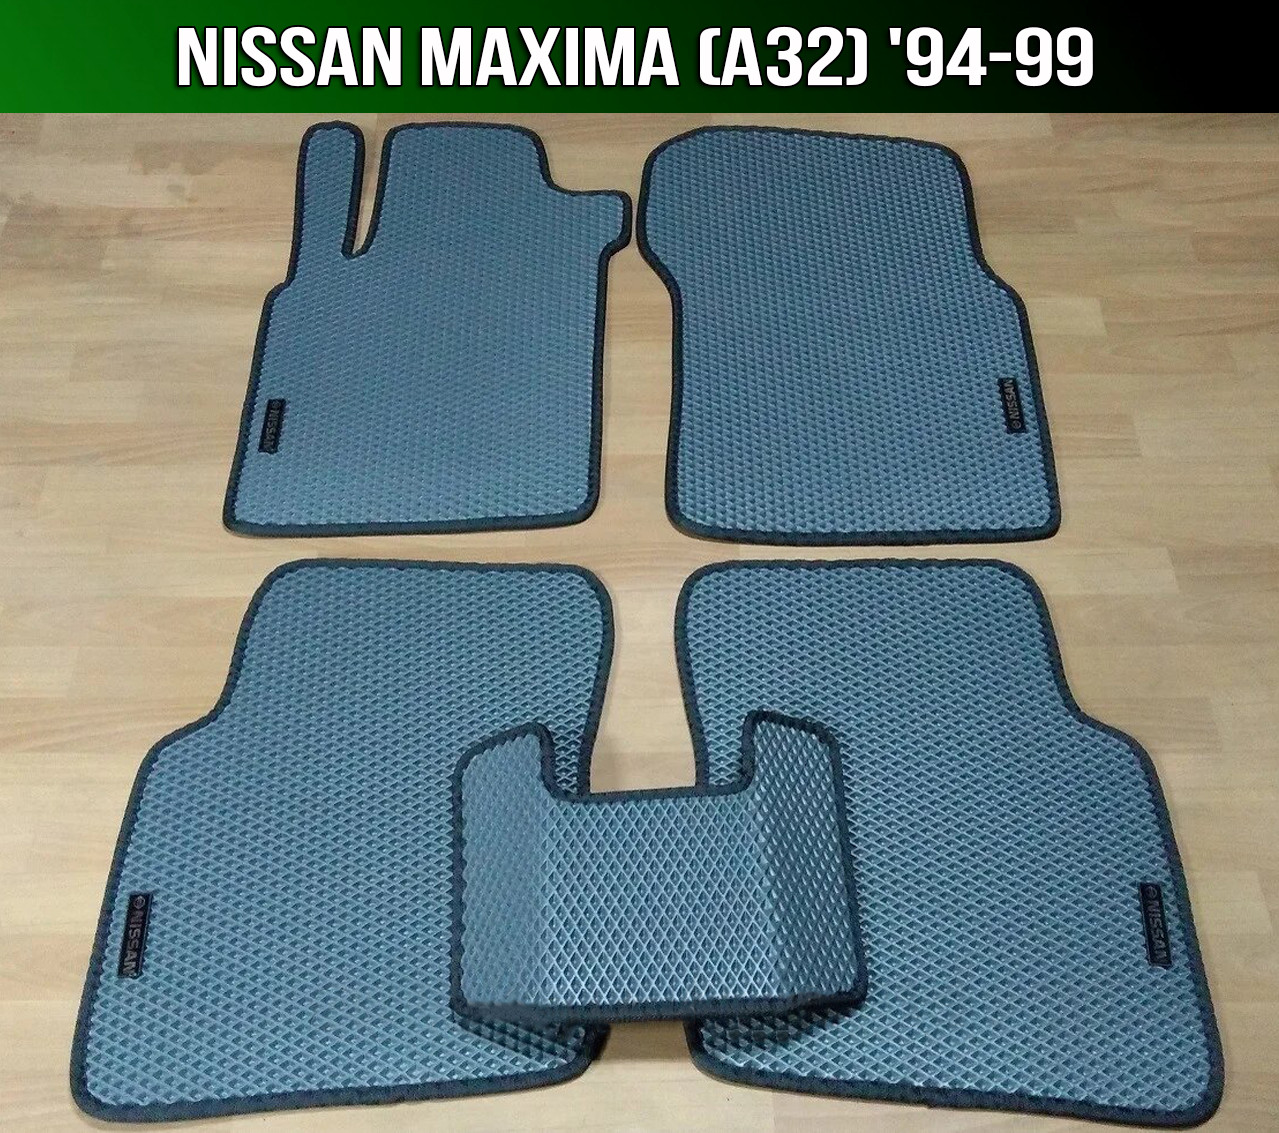 ЕВА коврики на Nissan Maxima (A32) '94-99. Ковры EVA Ниссан Максима